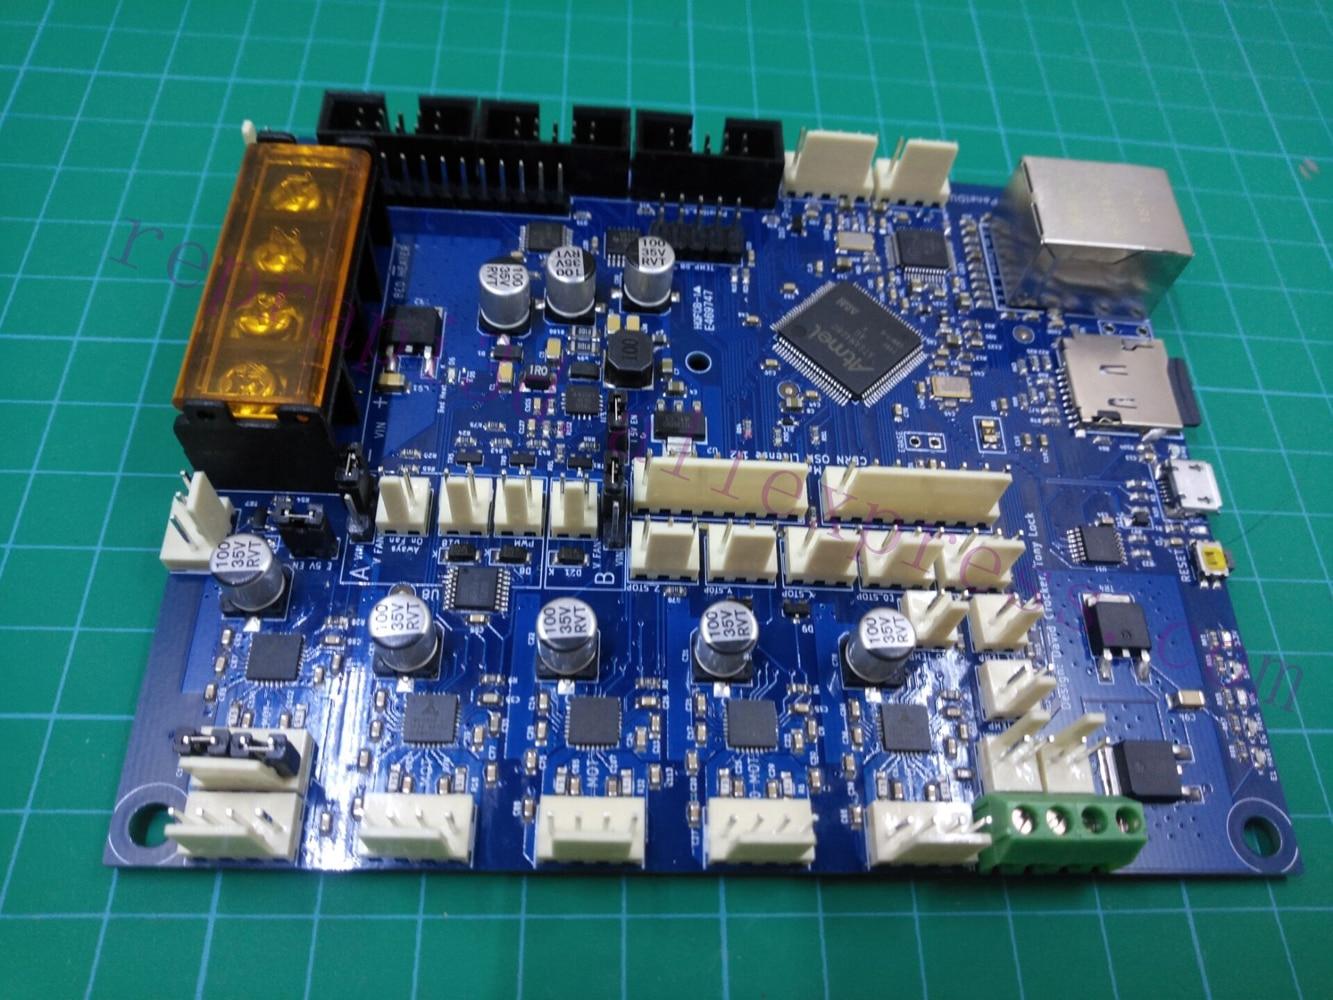 Latest Cloned Duet 2 Maestro Open source 3D Printer Electronics Board Advanced 32bit Motherboard for 3D Printer CNC Machine